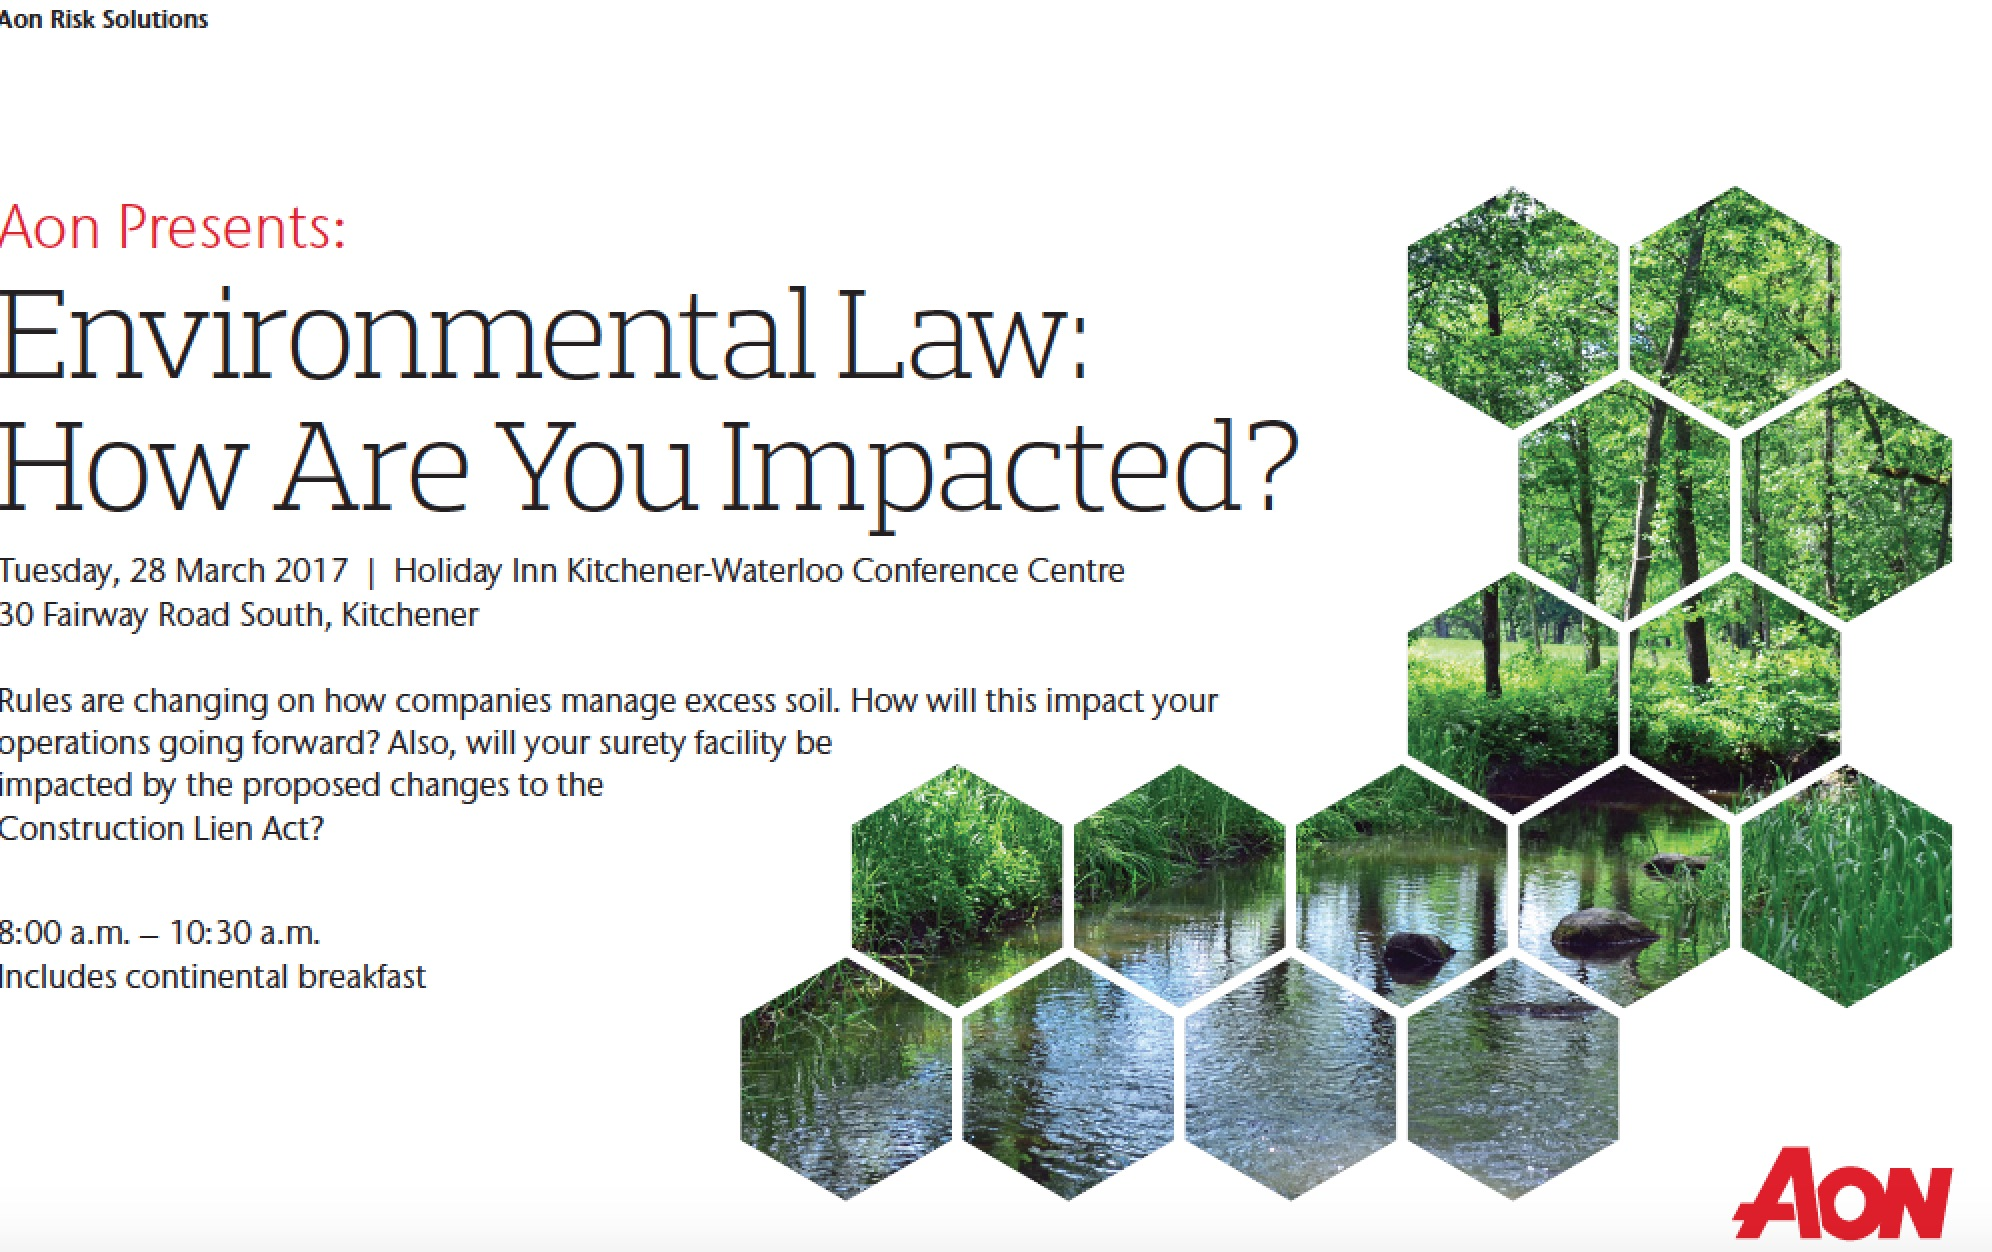 Aon presents environmental law program in KItchener | ontario ...